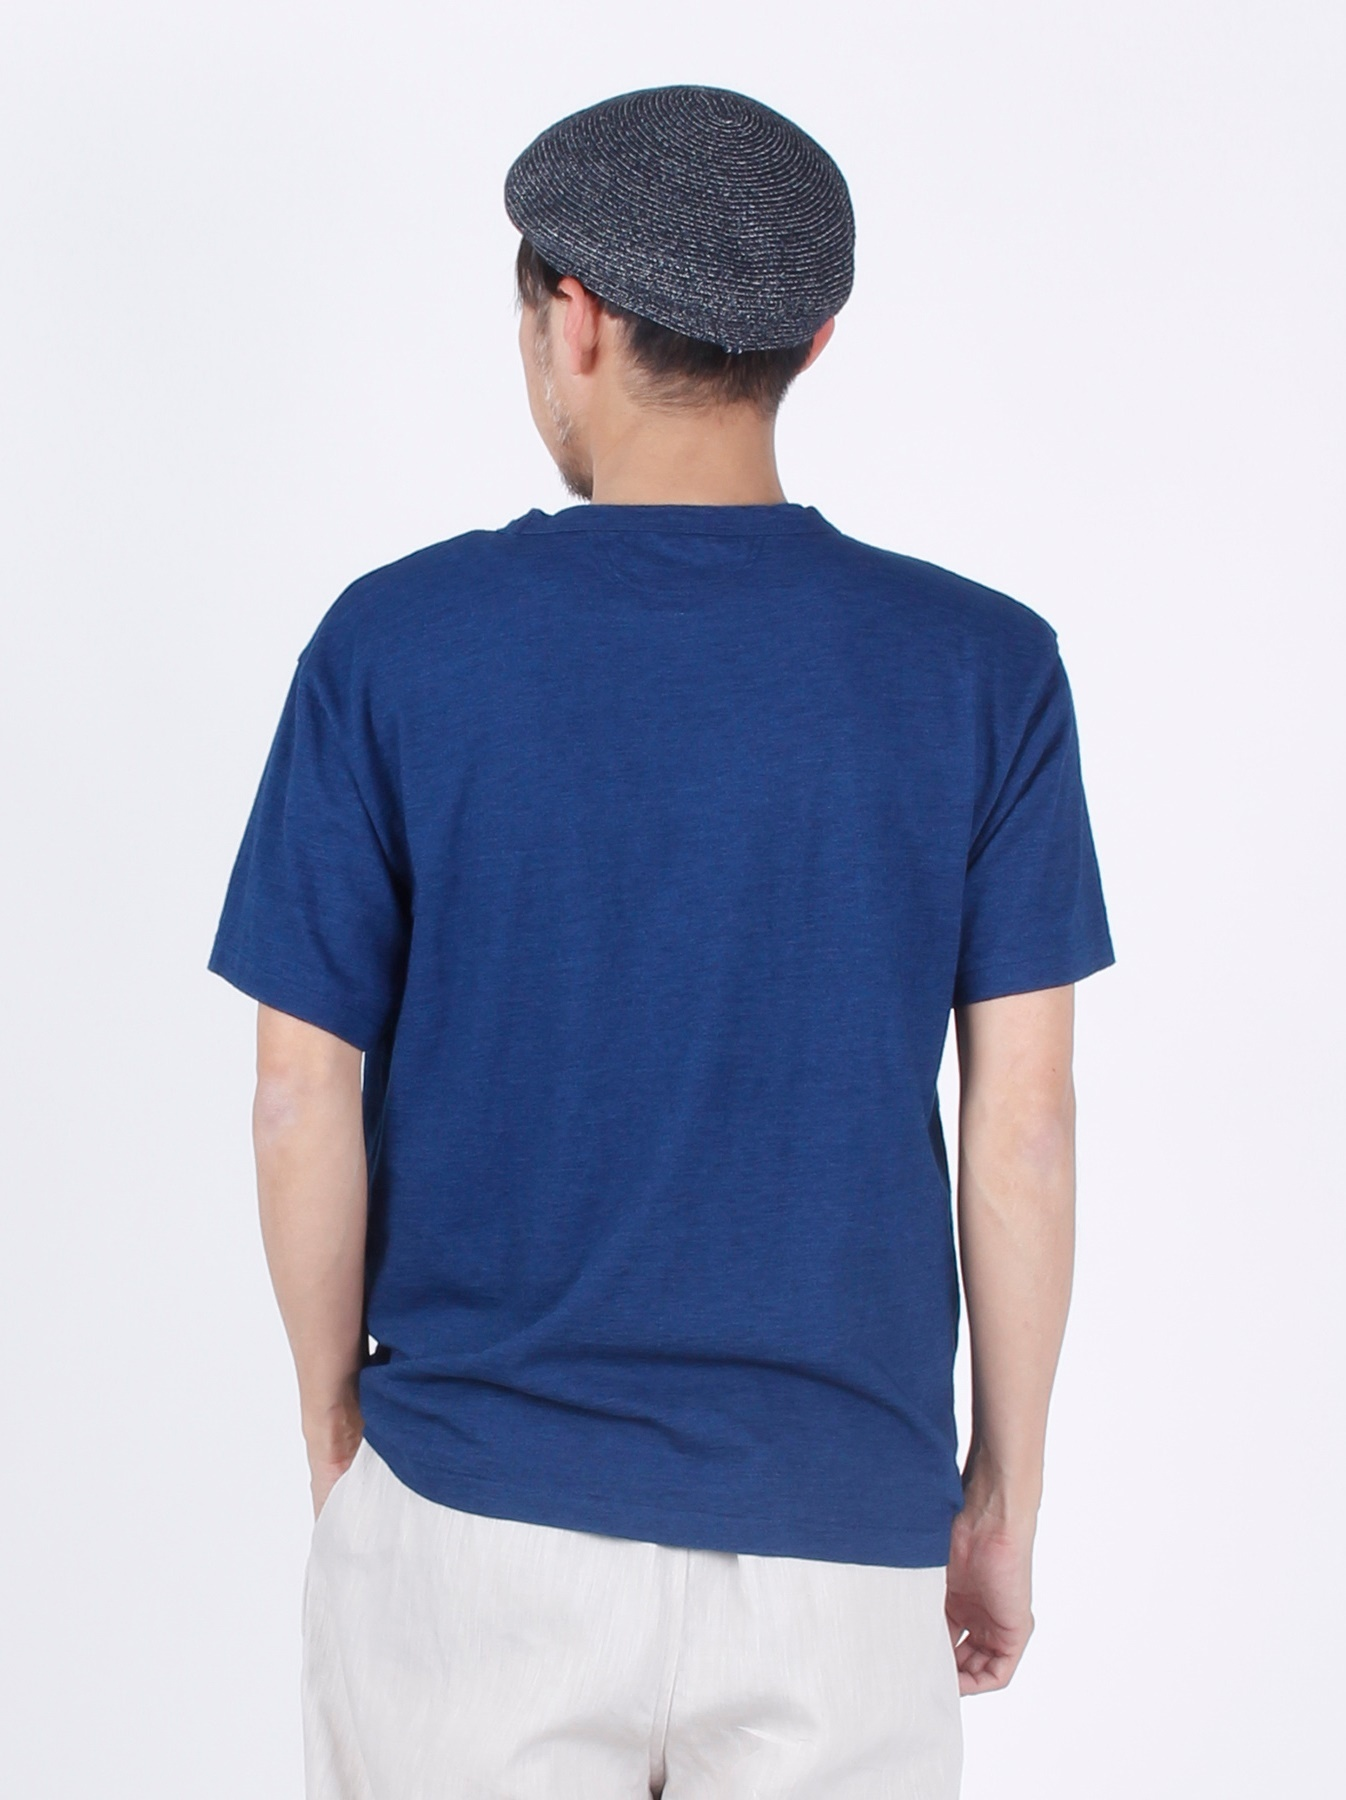 WH Indigo R Emblem T-shirt-5